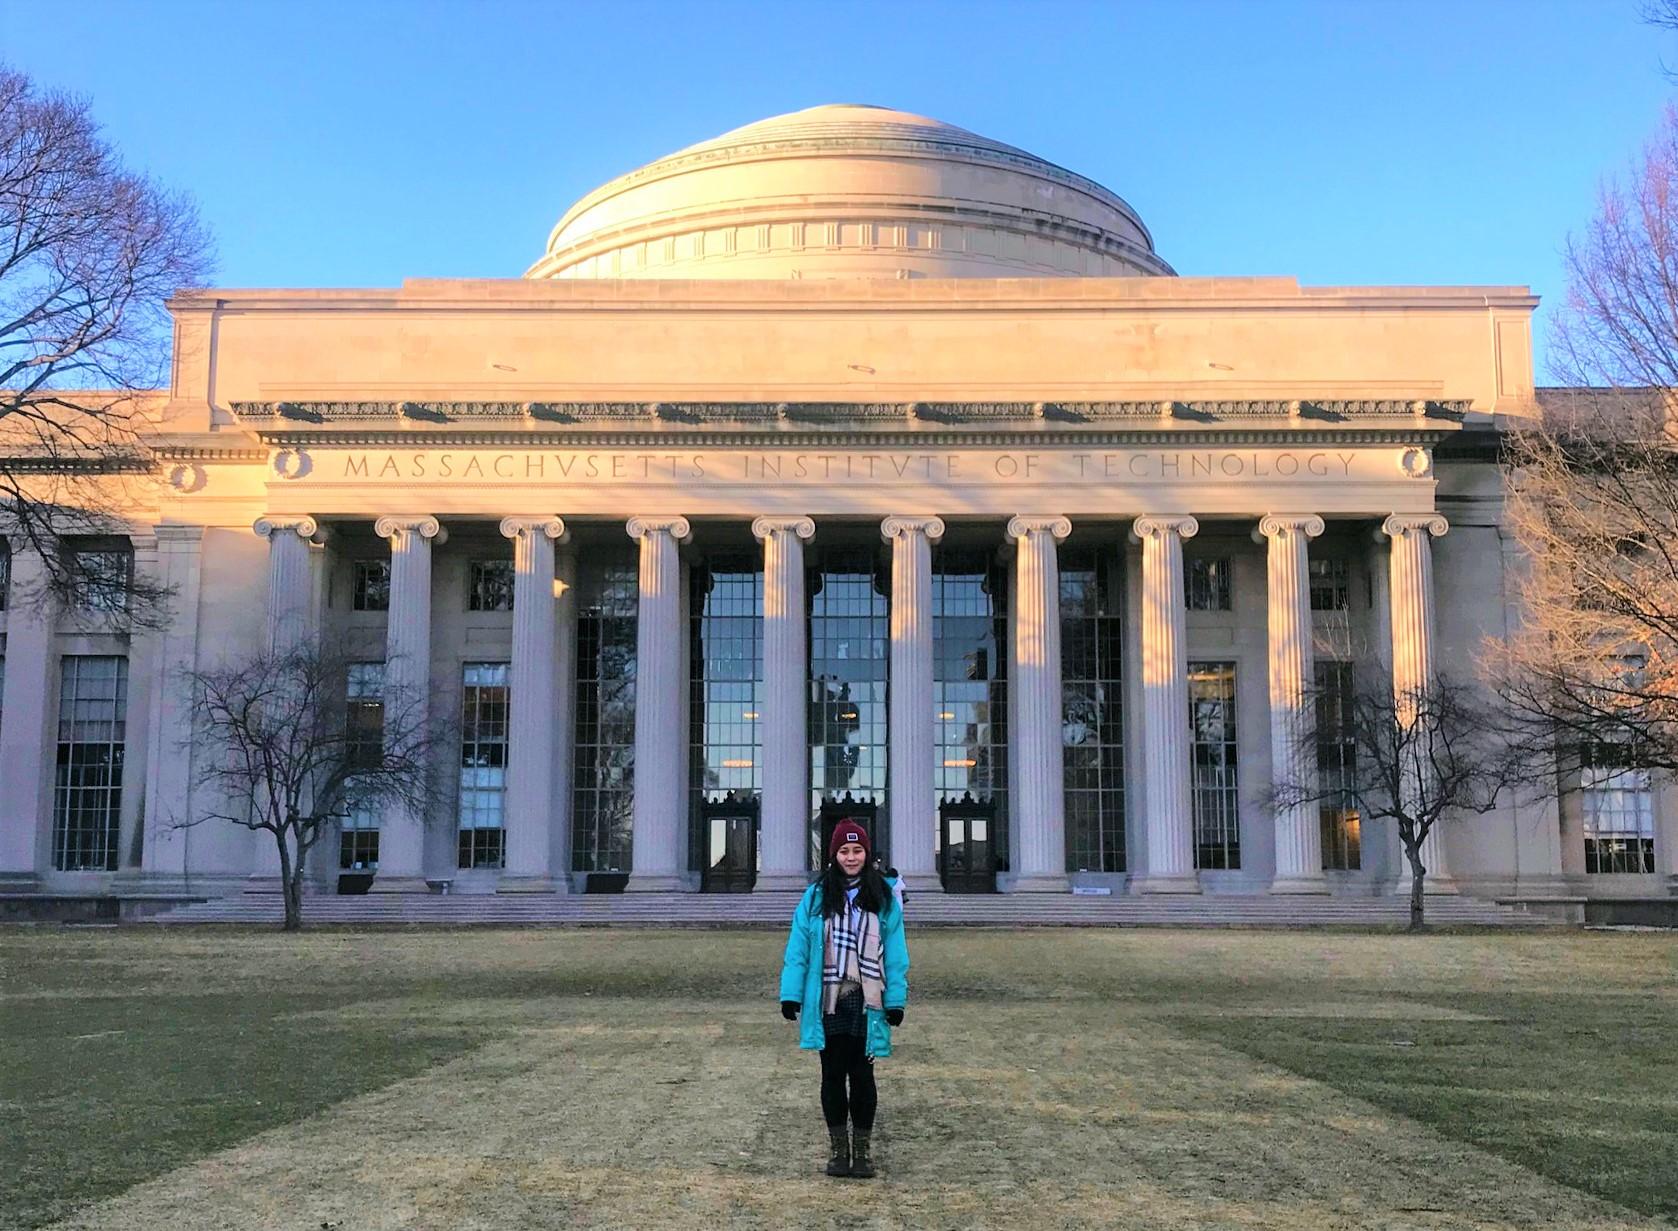 Vivi Tran, QUT student at MIT